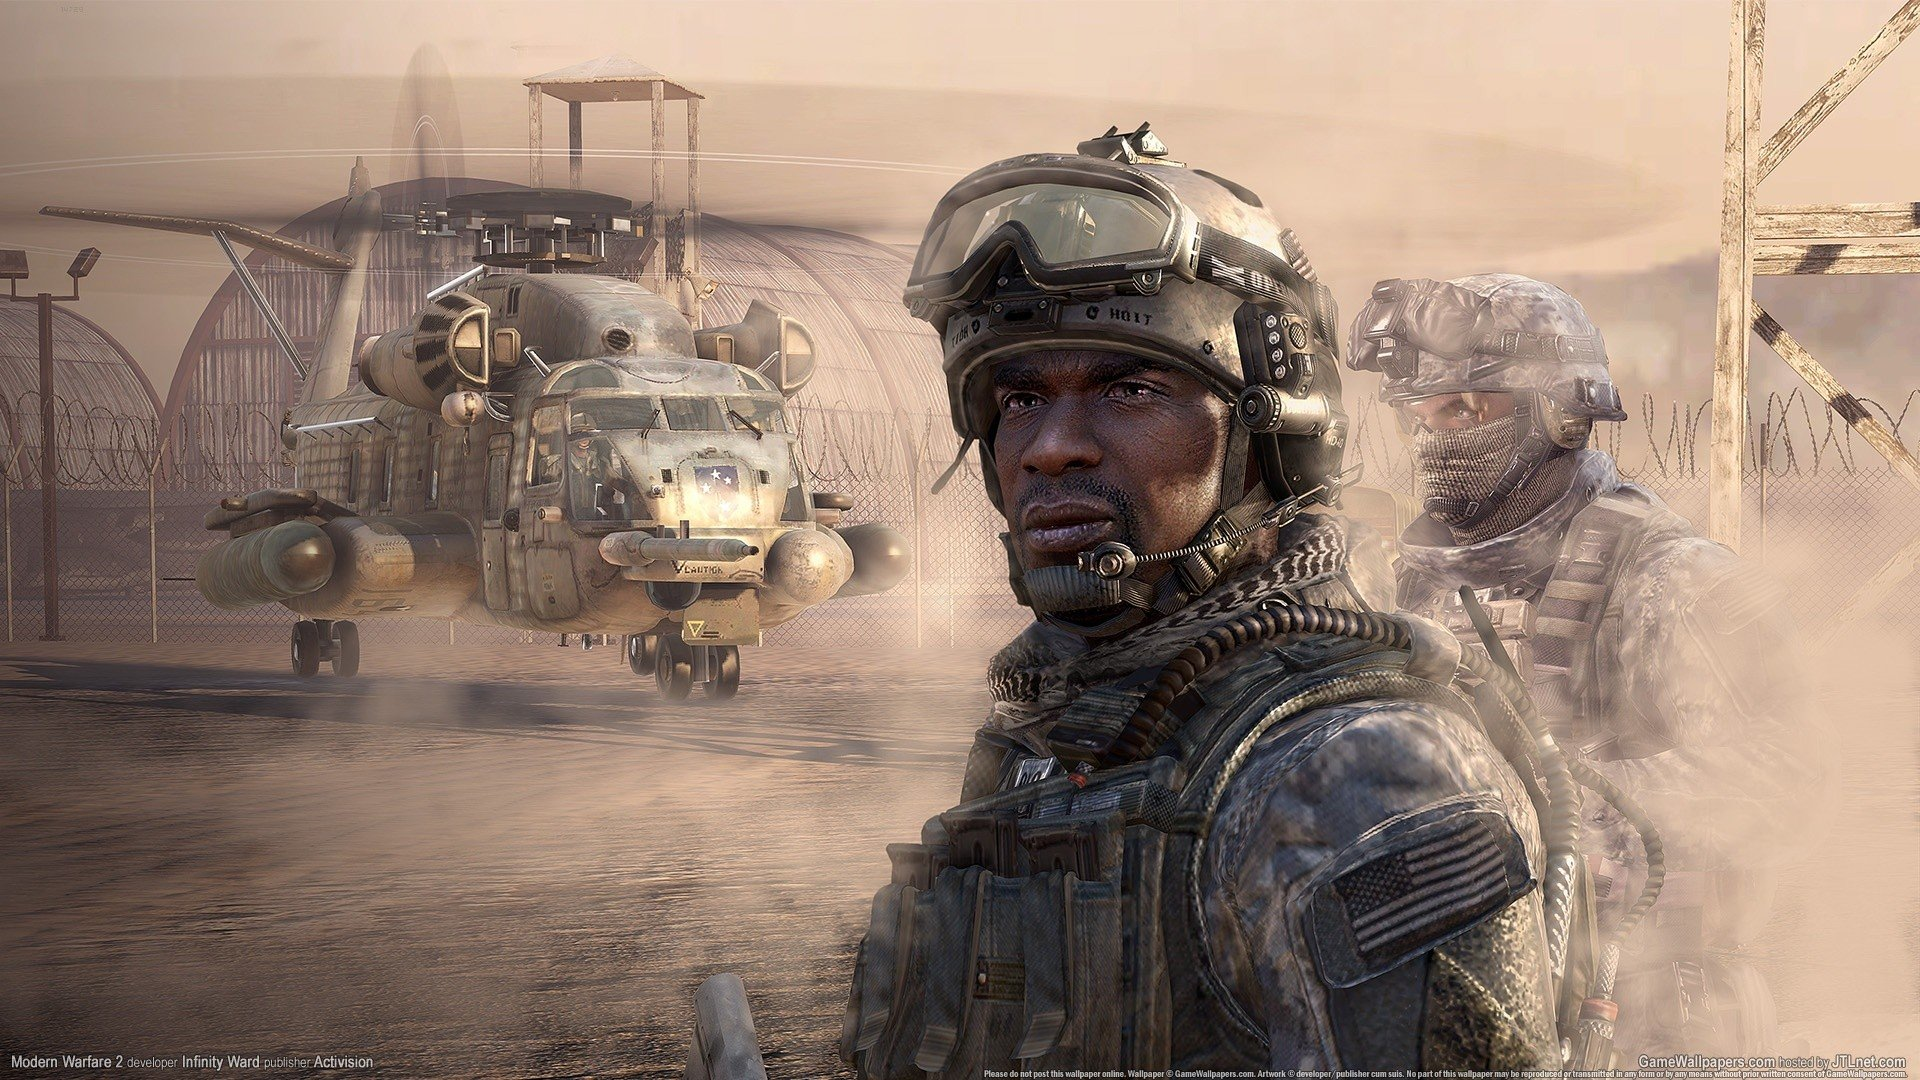 Call Of Duty: Modern Warfare 2 (MW2) wallpapers 1920x1080 ...